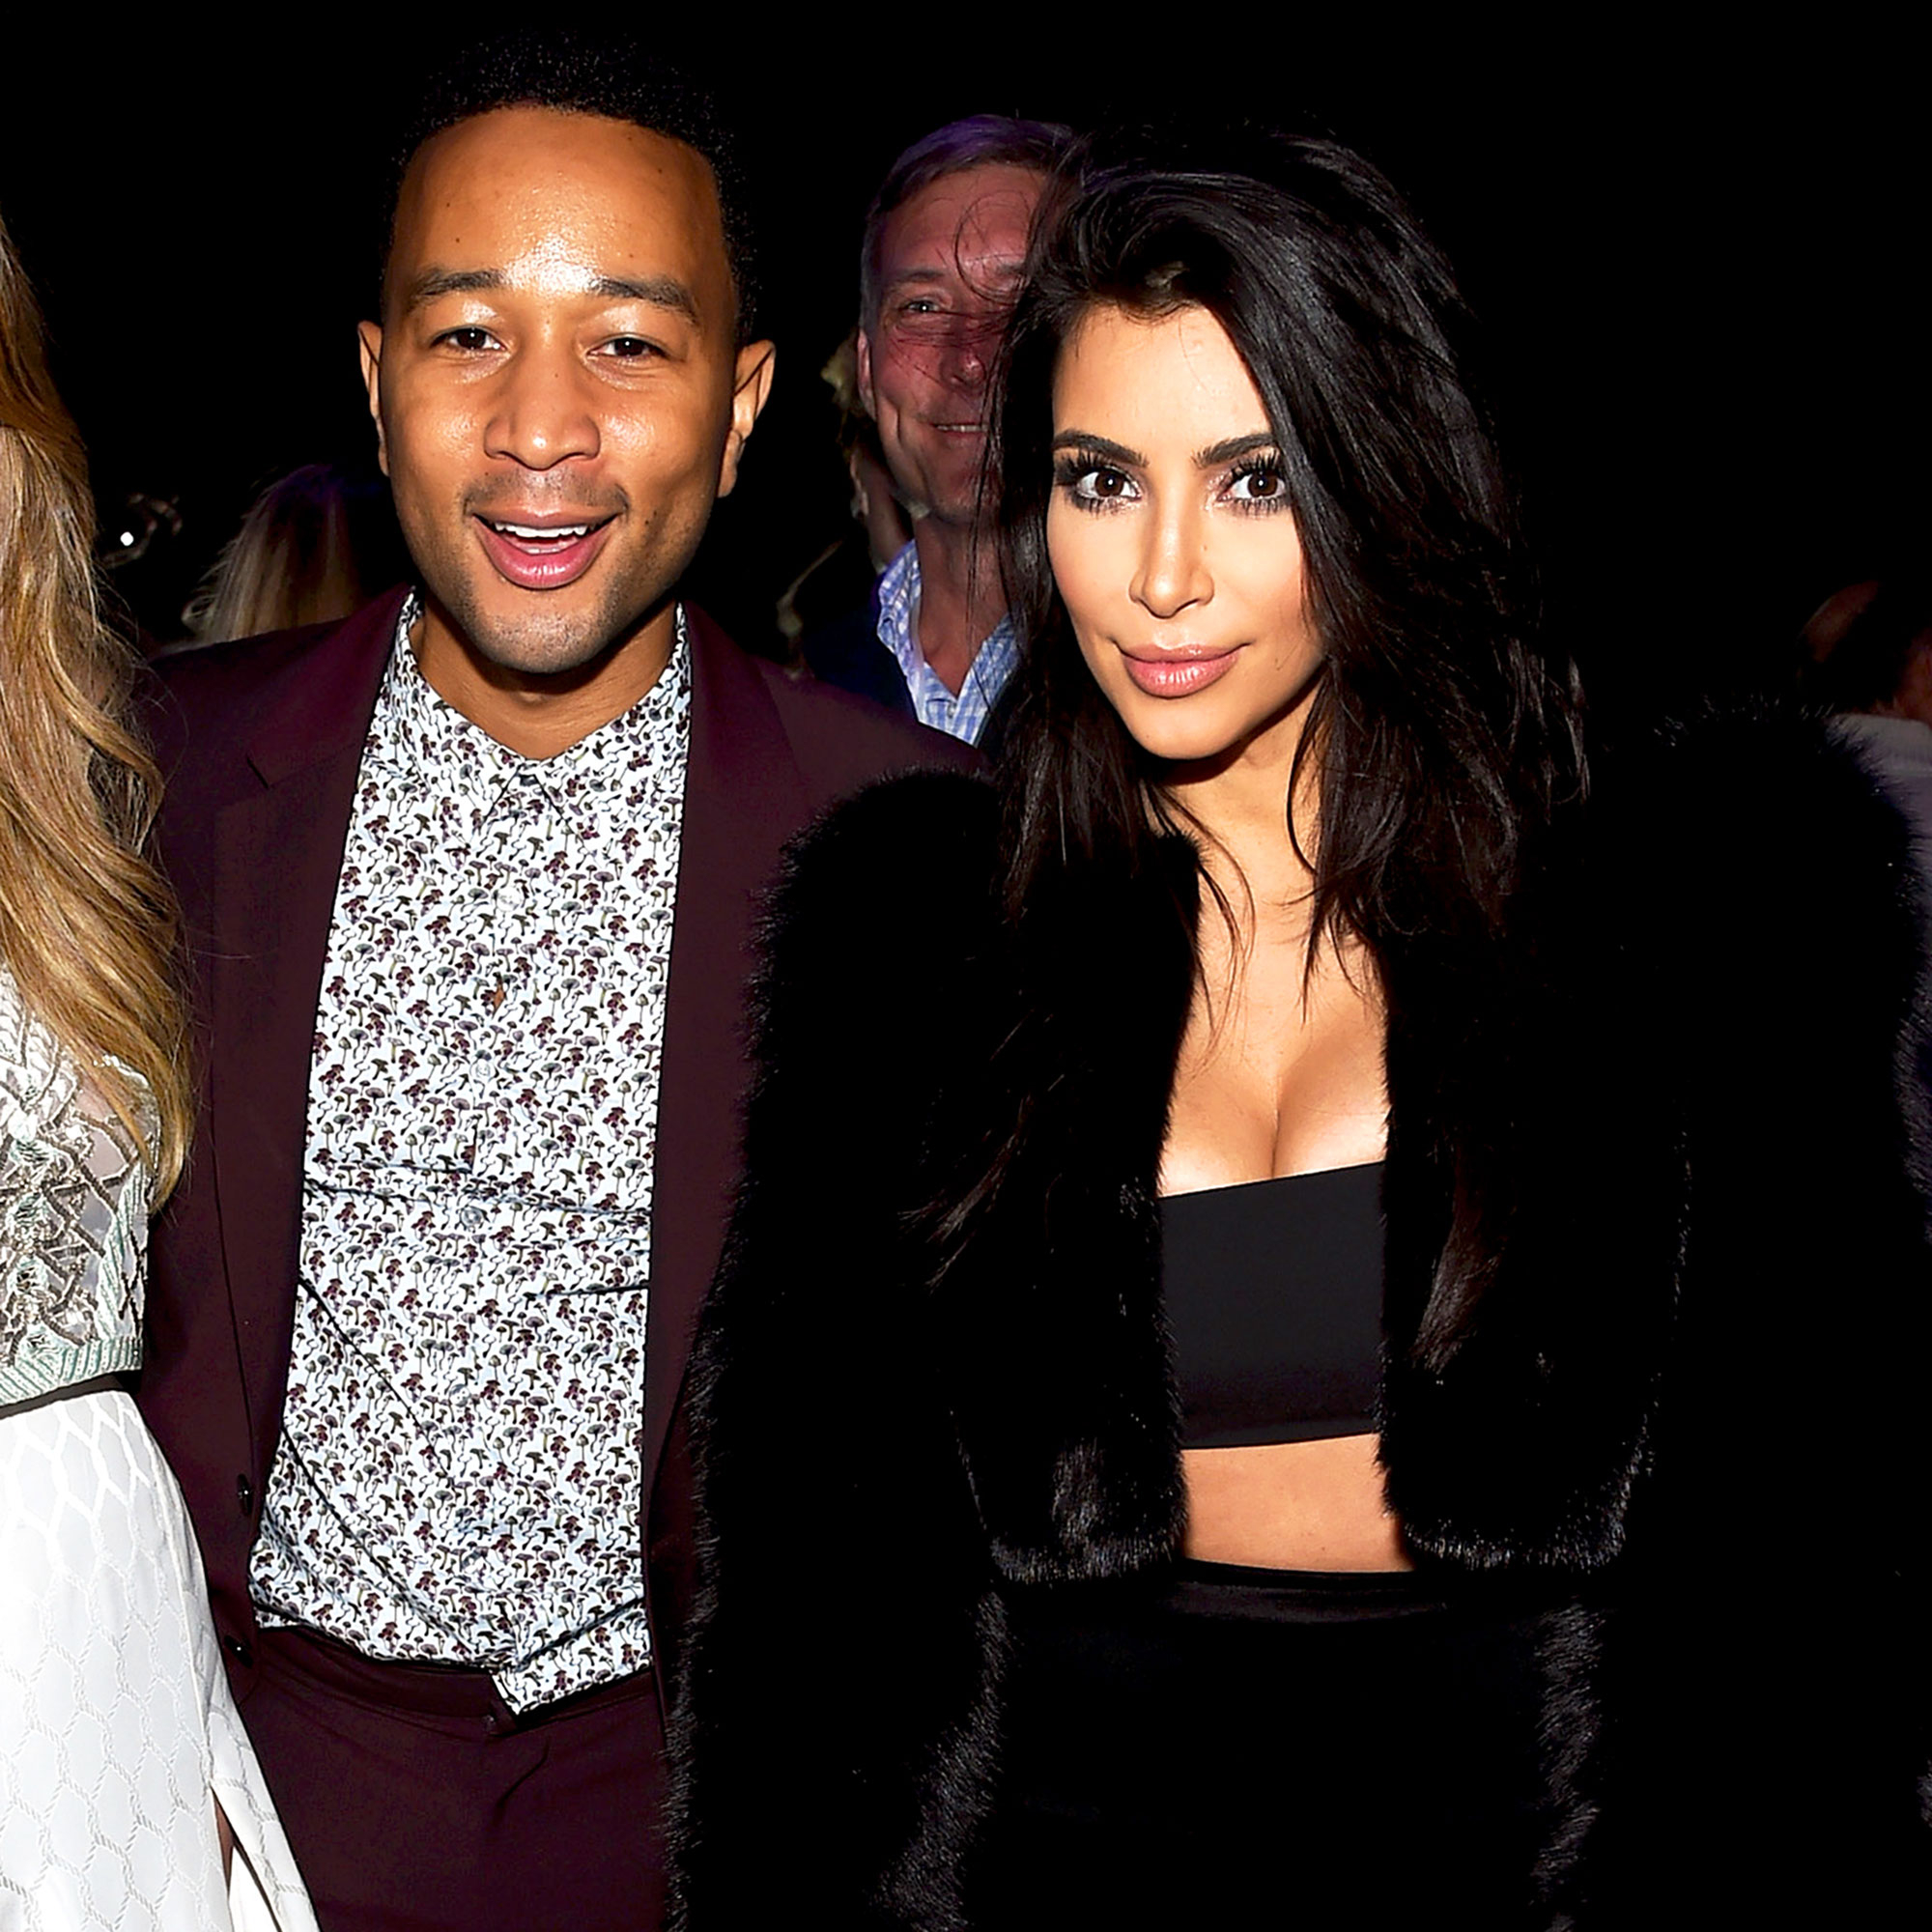 John Legend and Kim Kardashian